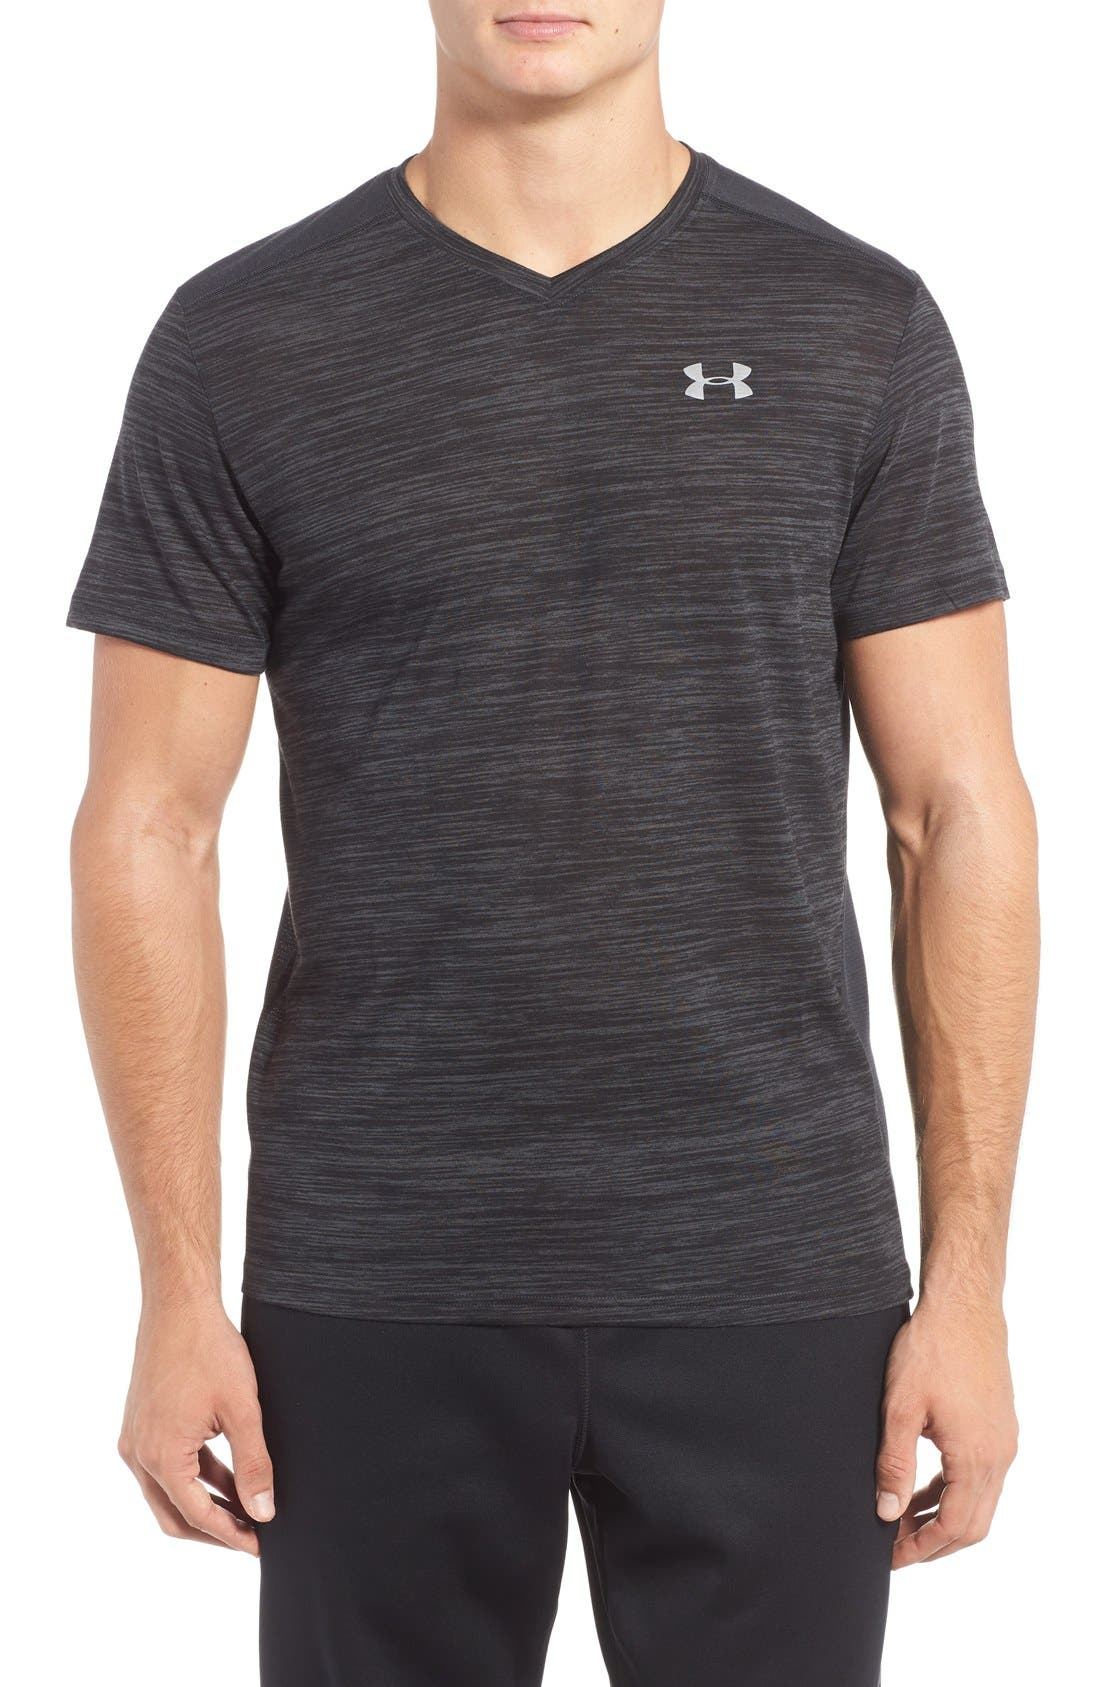 Under Armour 'Streaker Run' Microthread V-Neck T-Shirt